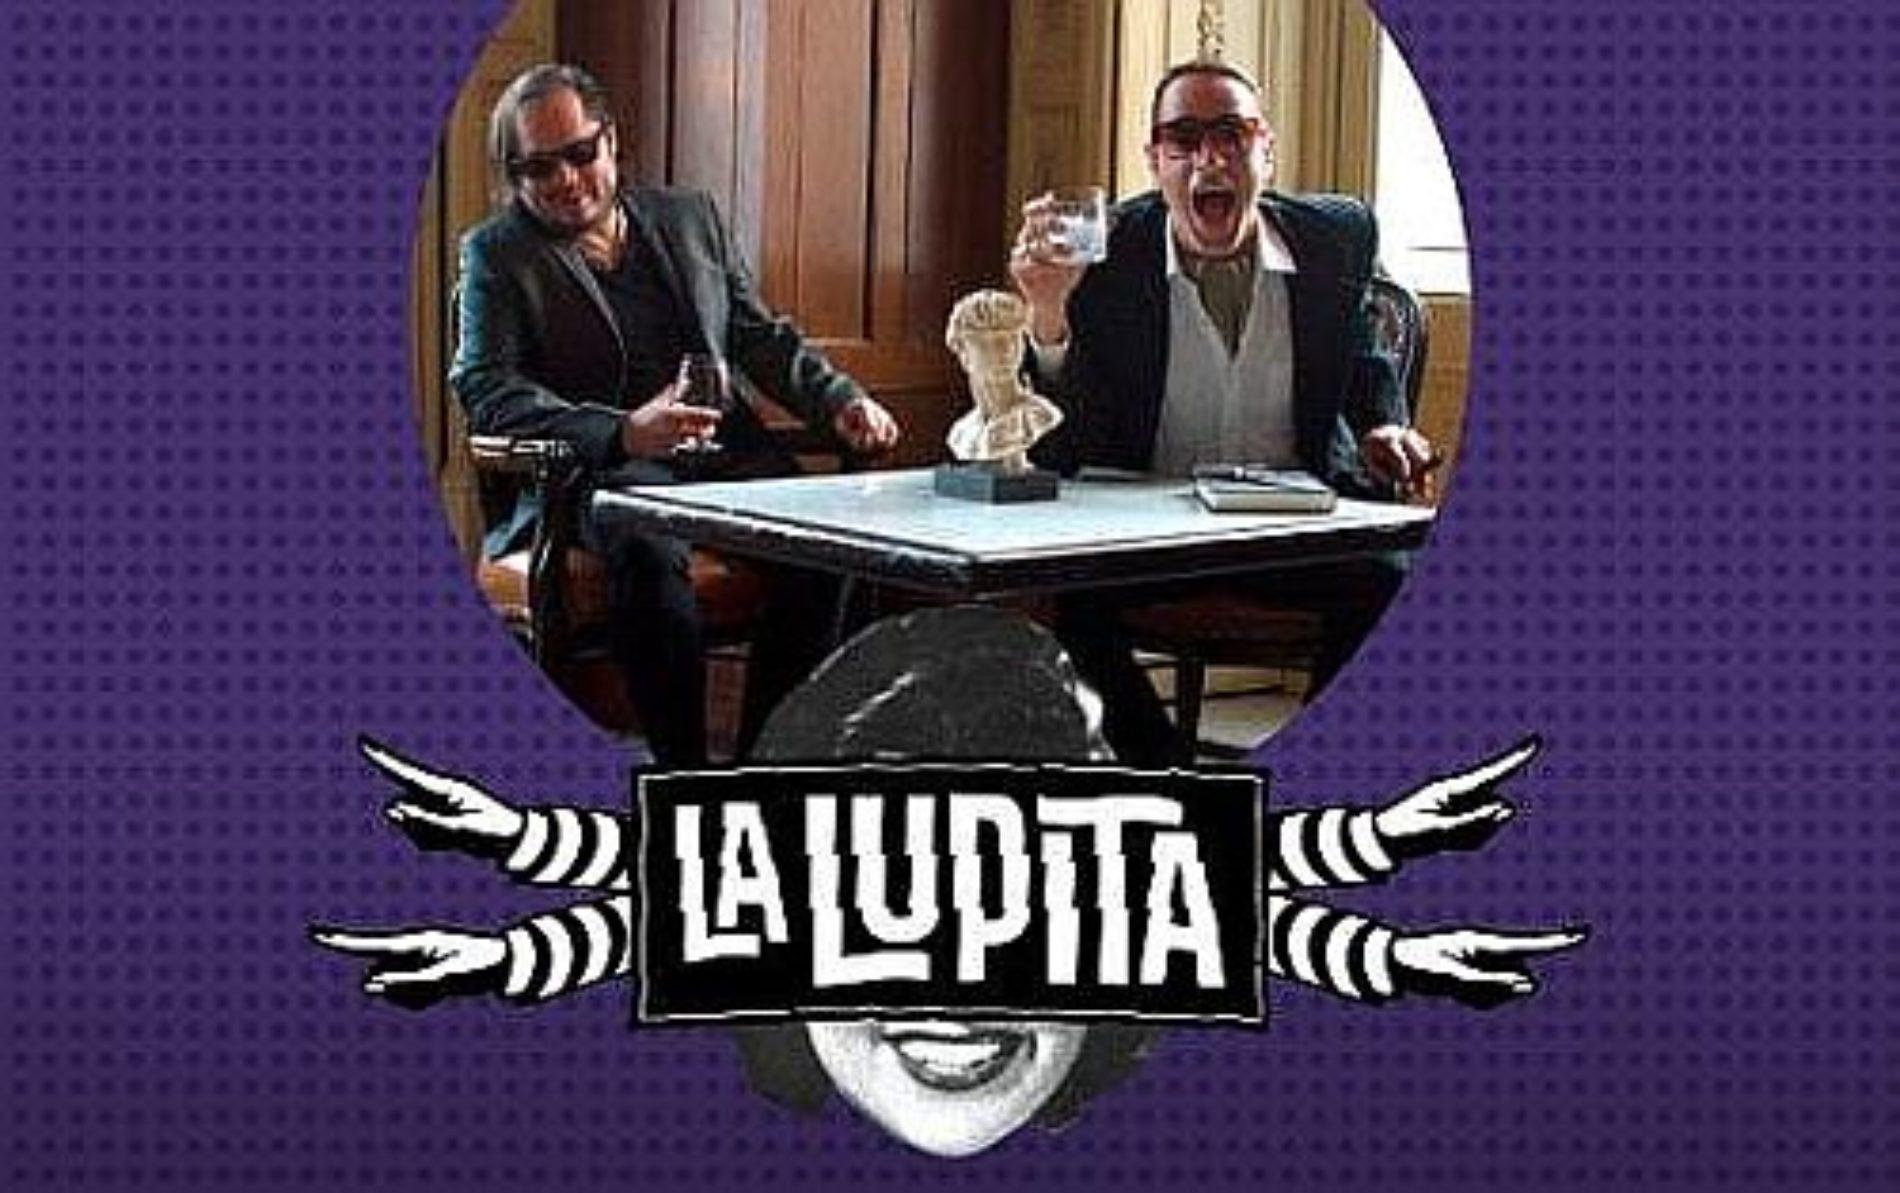 La lupita en Back Box Tijuana 2019